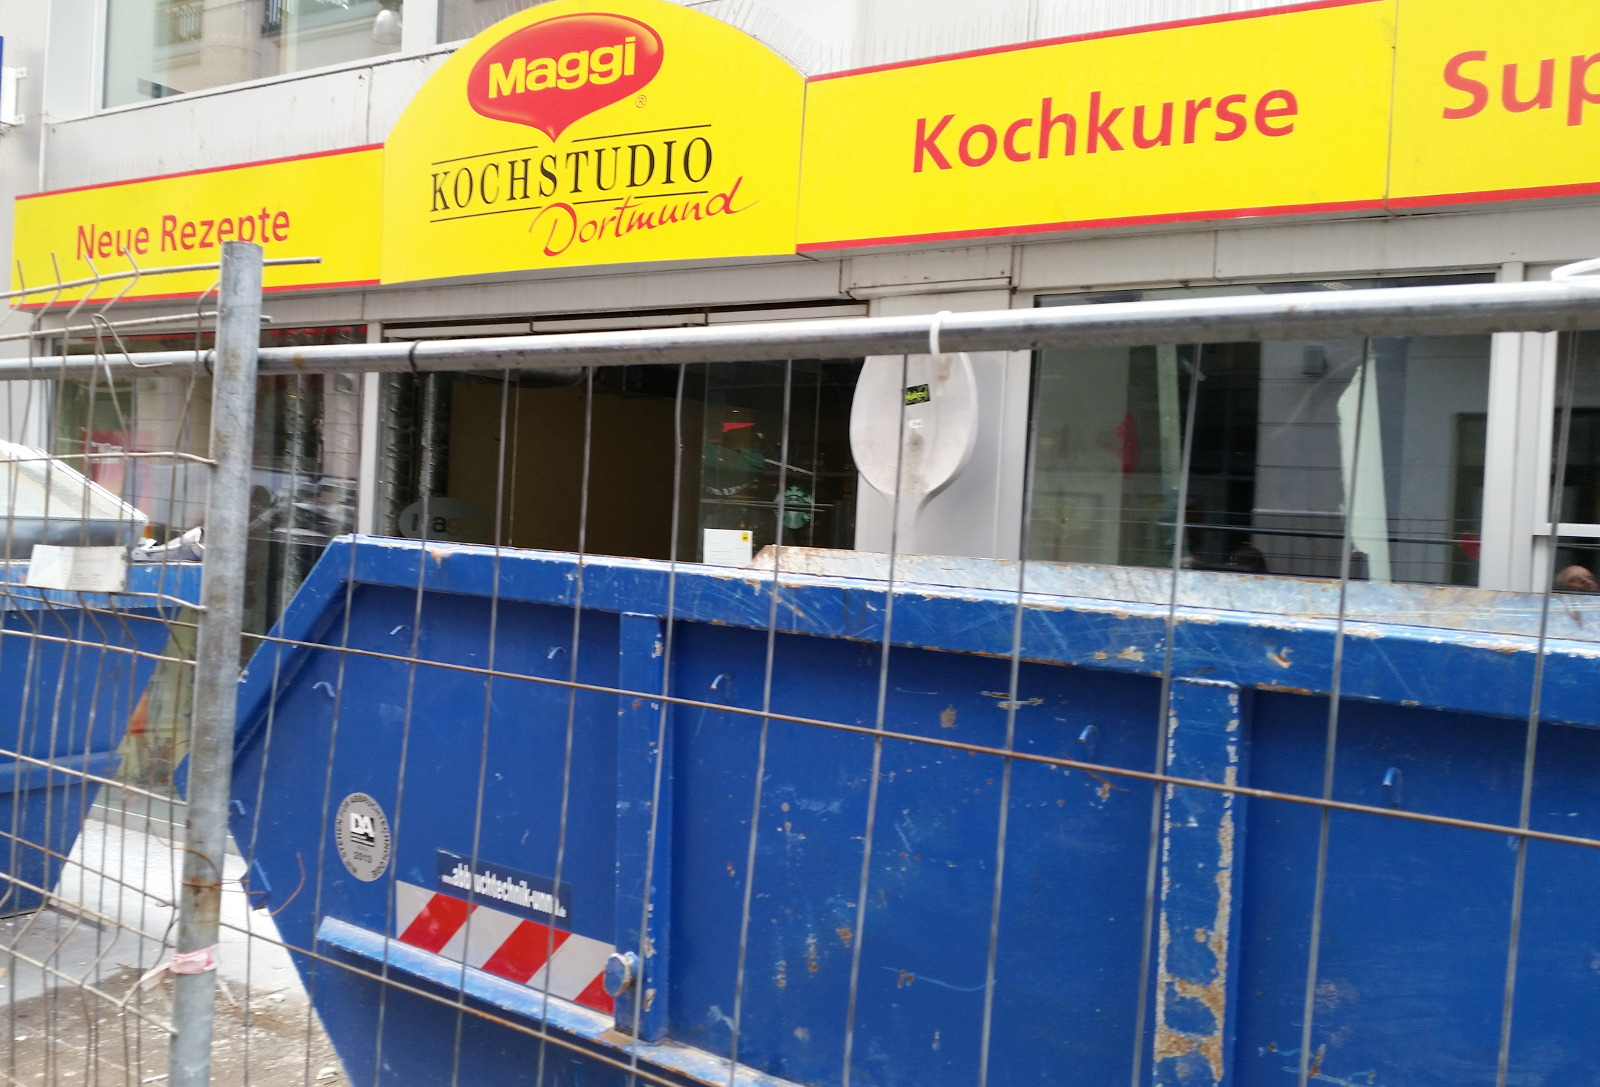 Kochkurse? Also Kochkurse gab es mal im Maggi-Kochstudio in Dortmund, Westfalen, Maggi-Fertiggericht-Kochkurse...